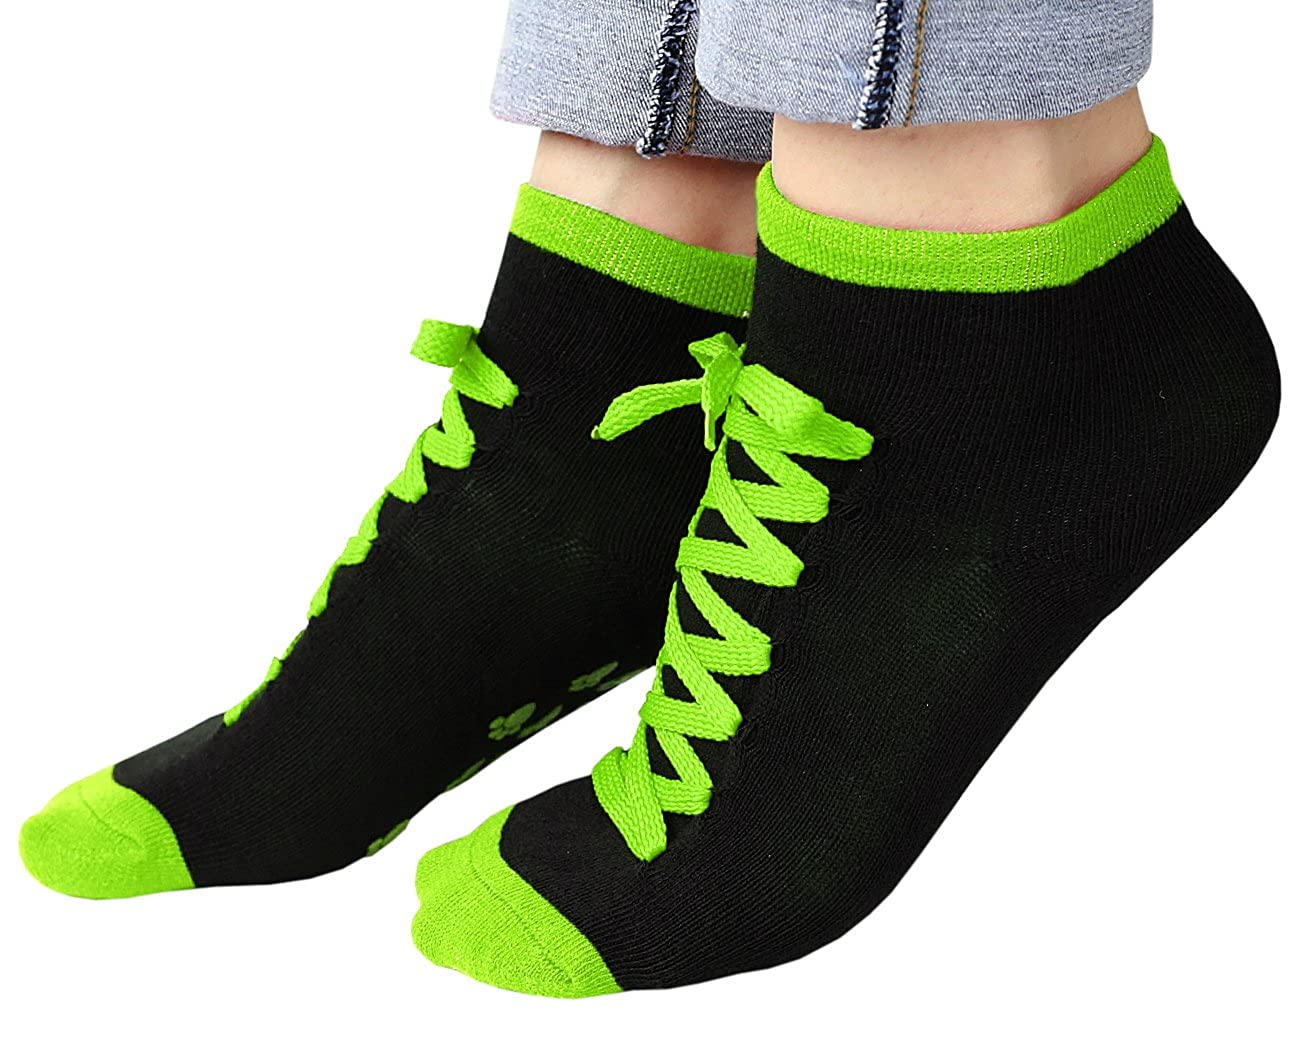 NYFASHION101 Paw Print Sole Non-Slip Shoelaced Slipper Socks Green